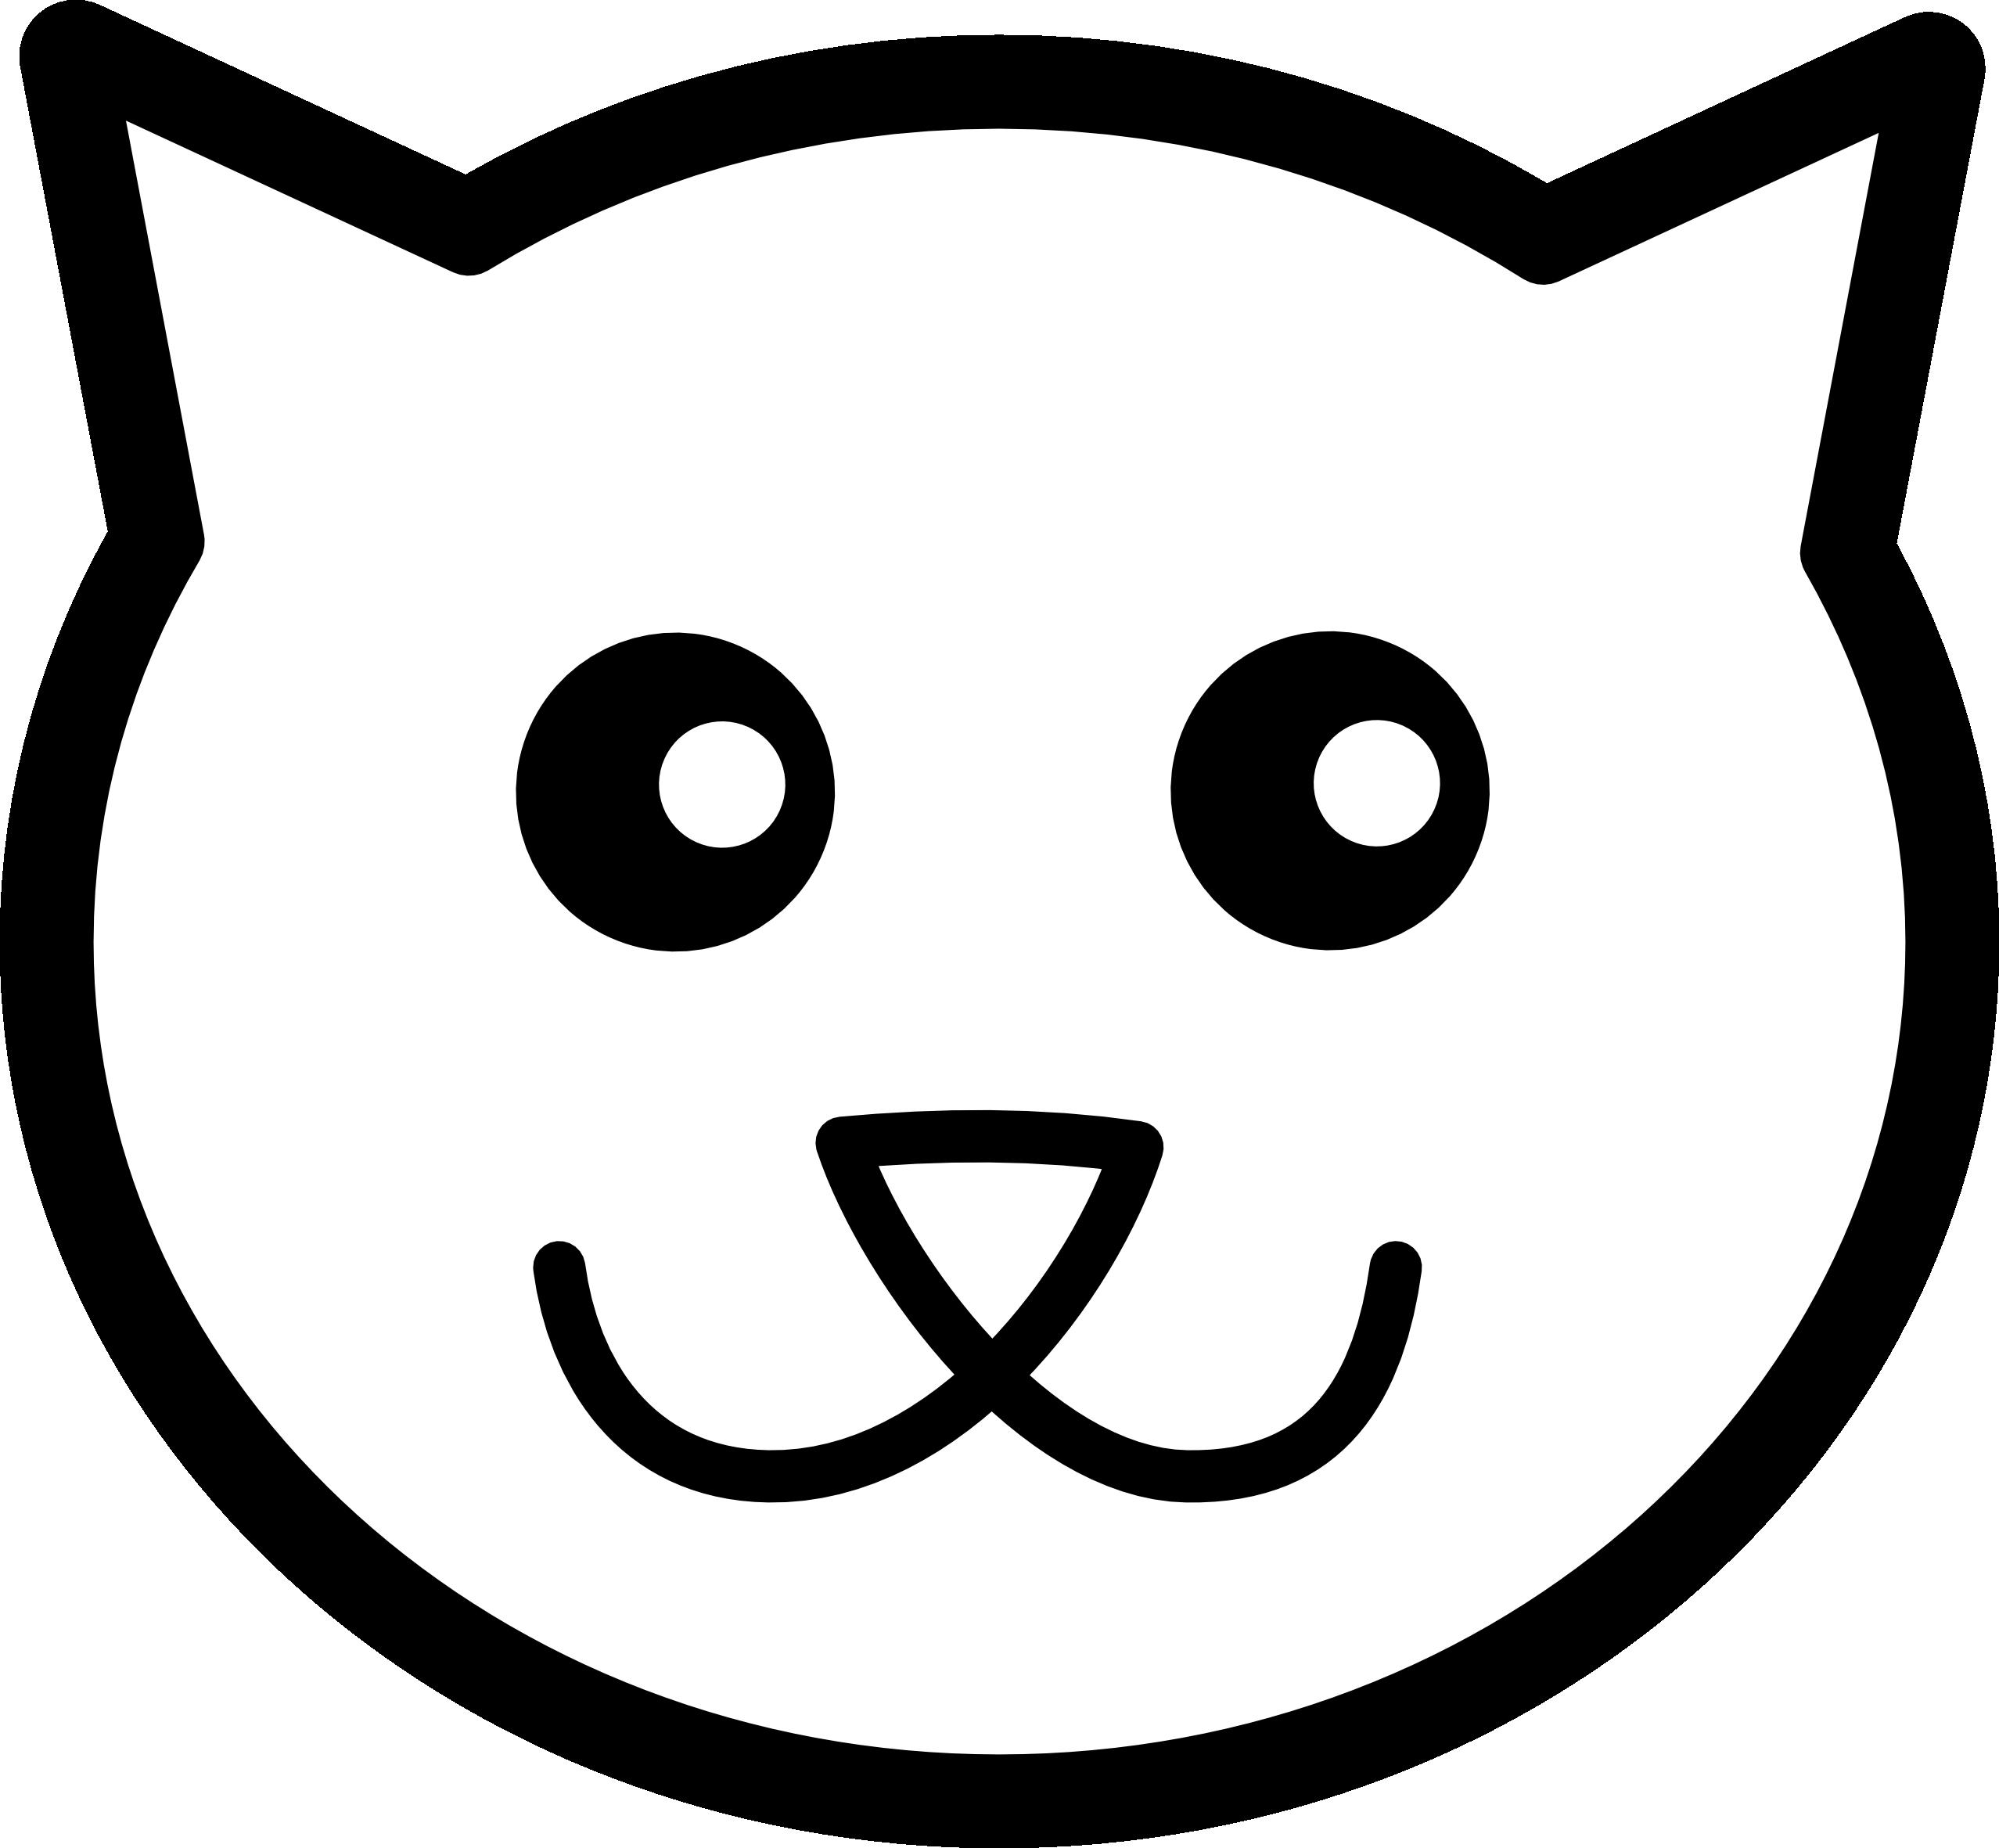 Nose clipart color. Black cat dog face